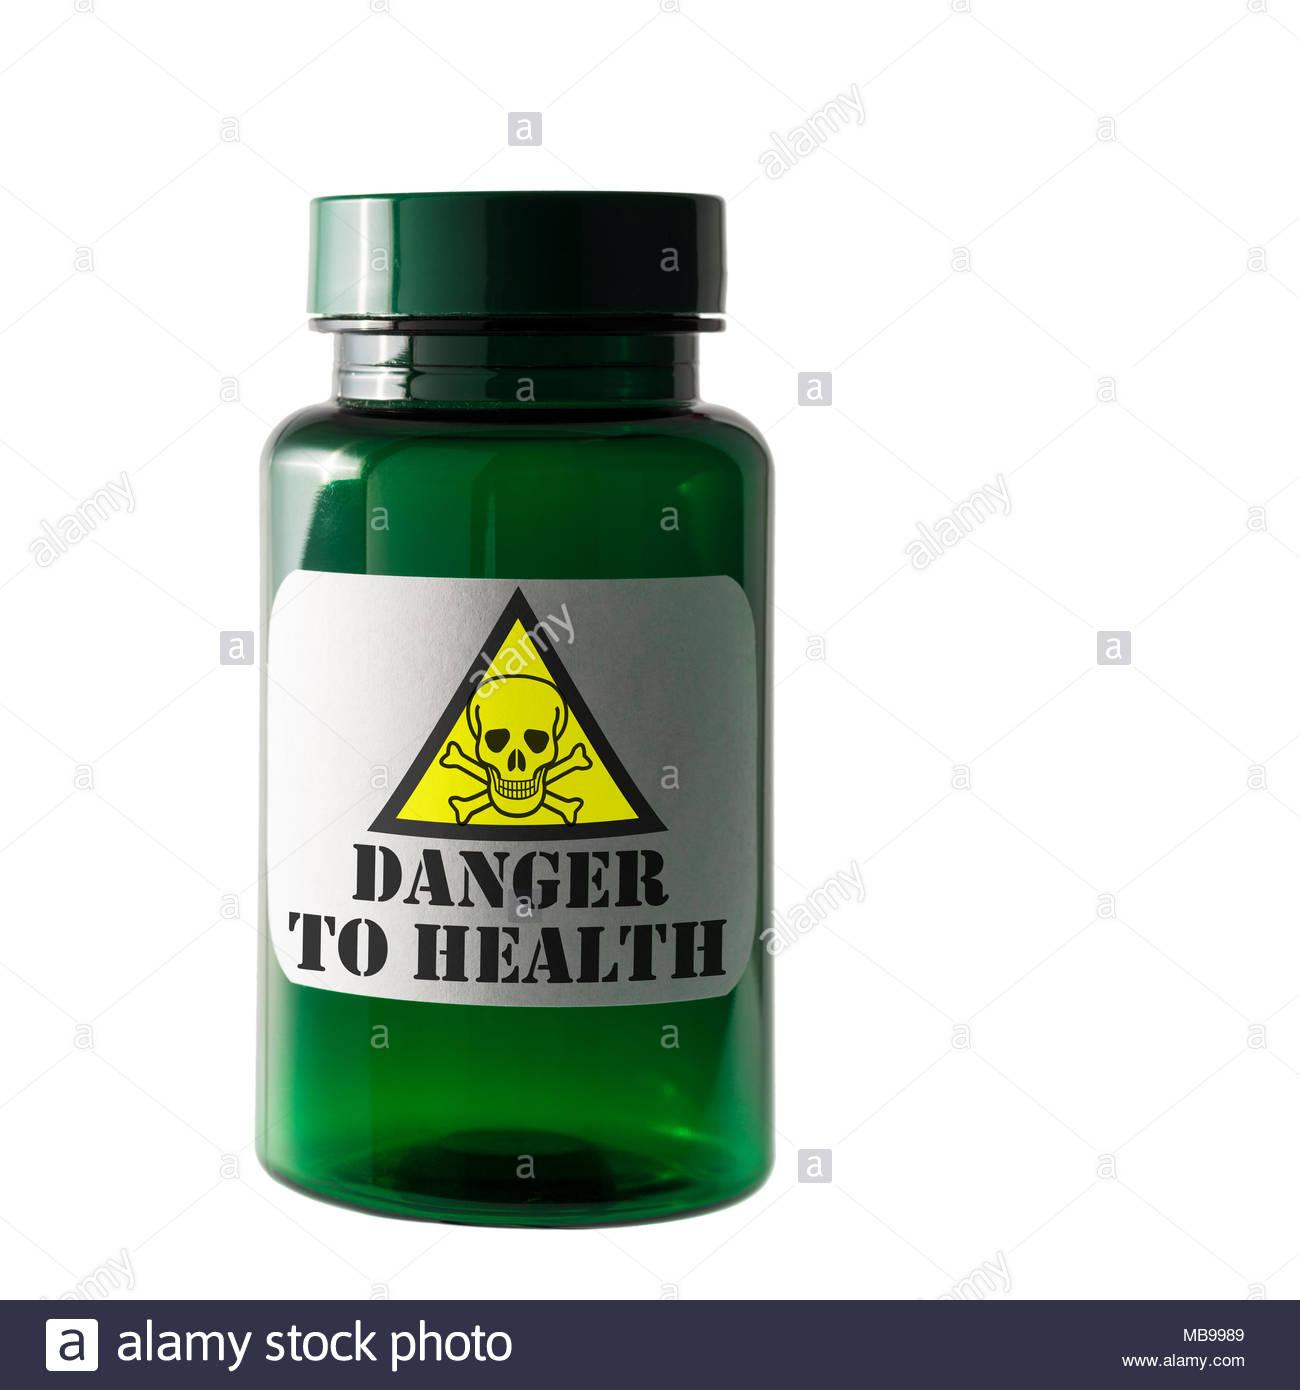 Danger to health label, Dorset, England, UK Stock Photo